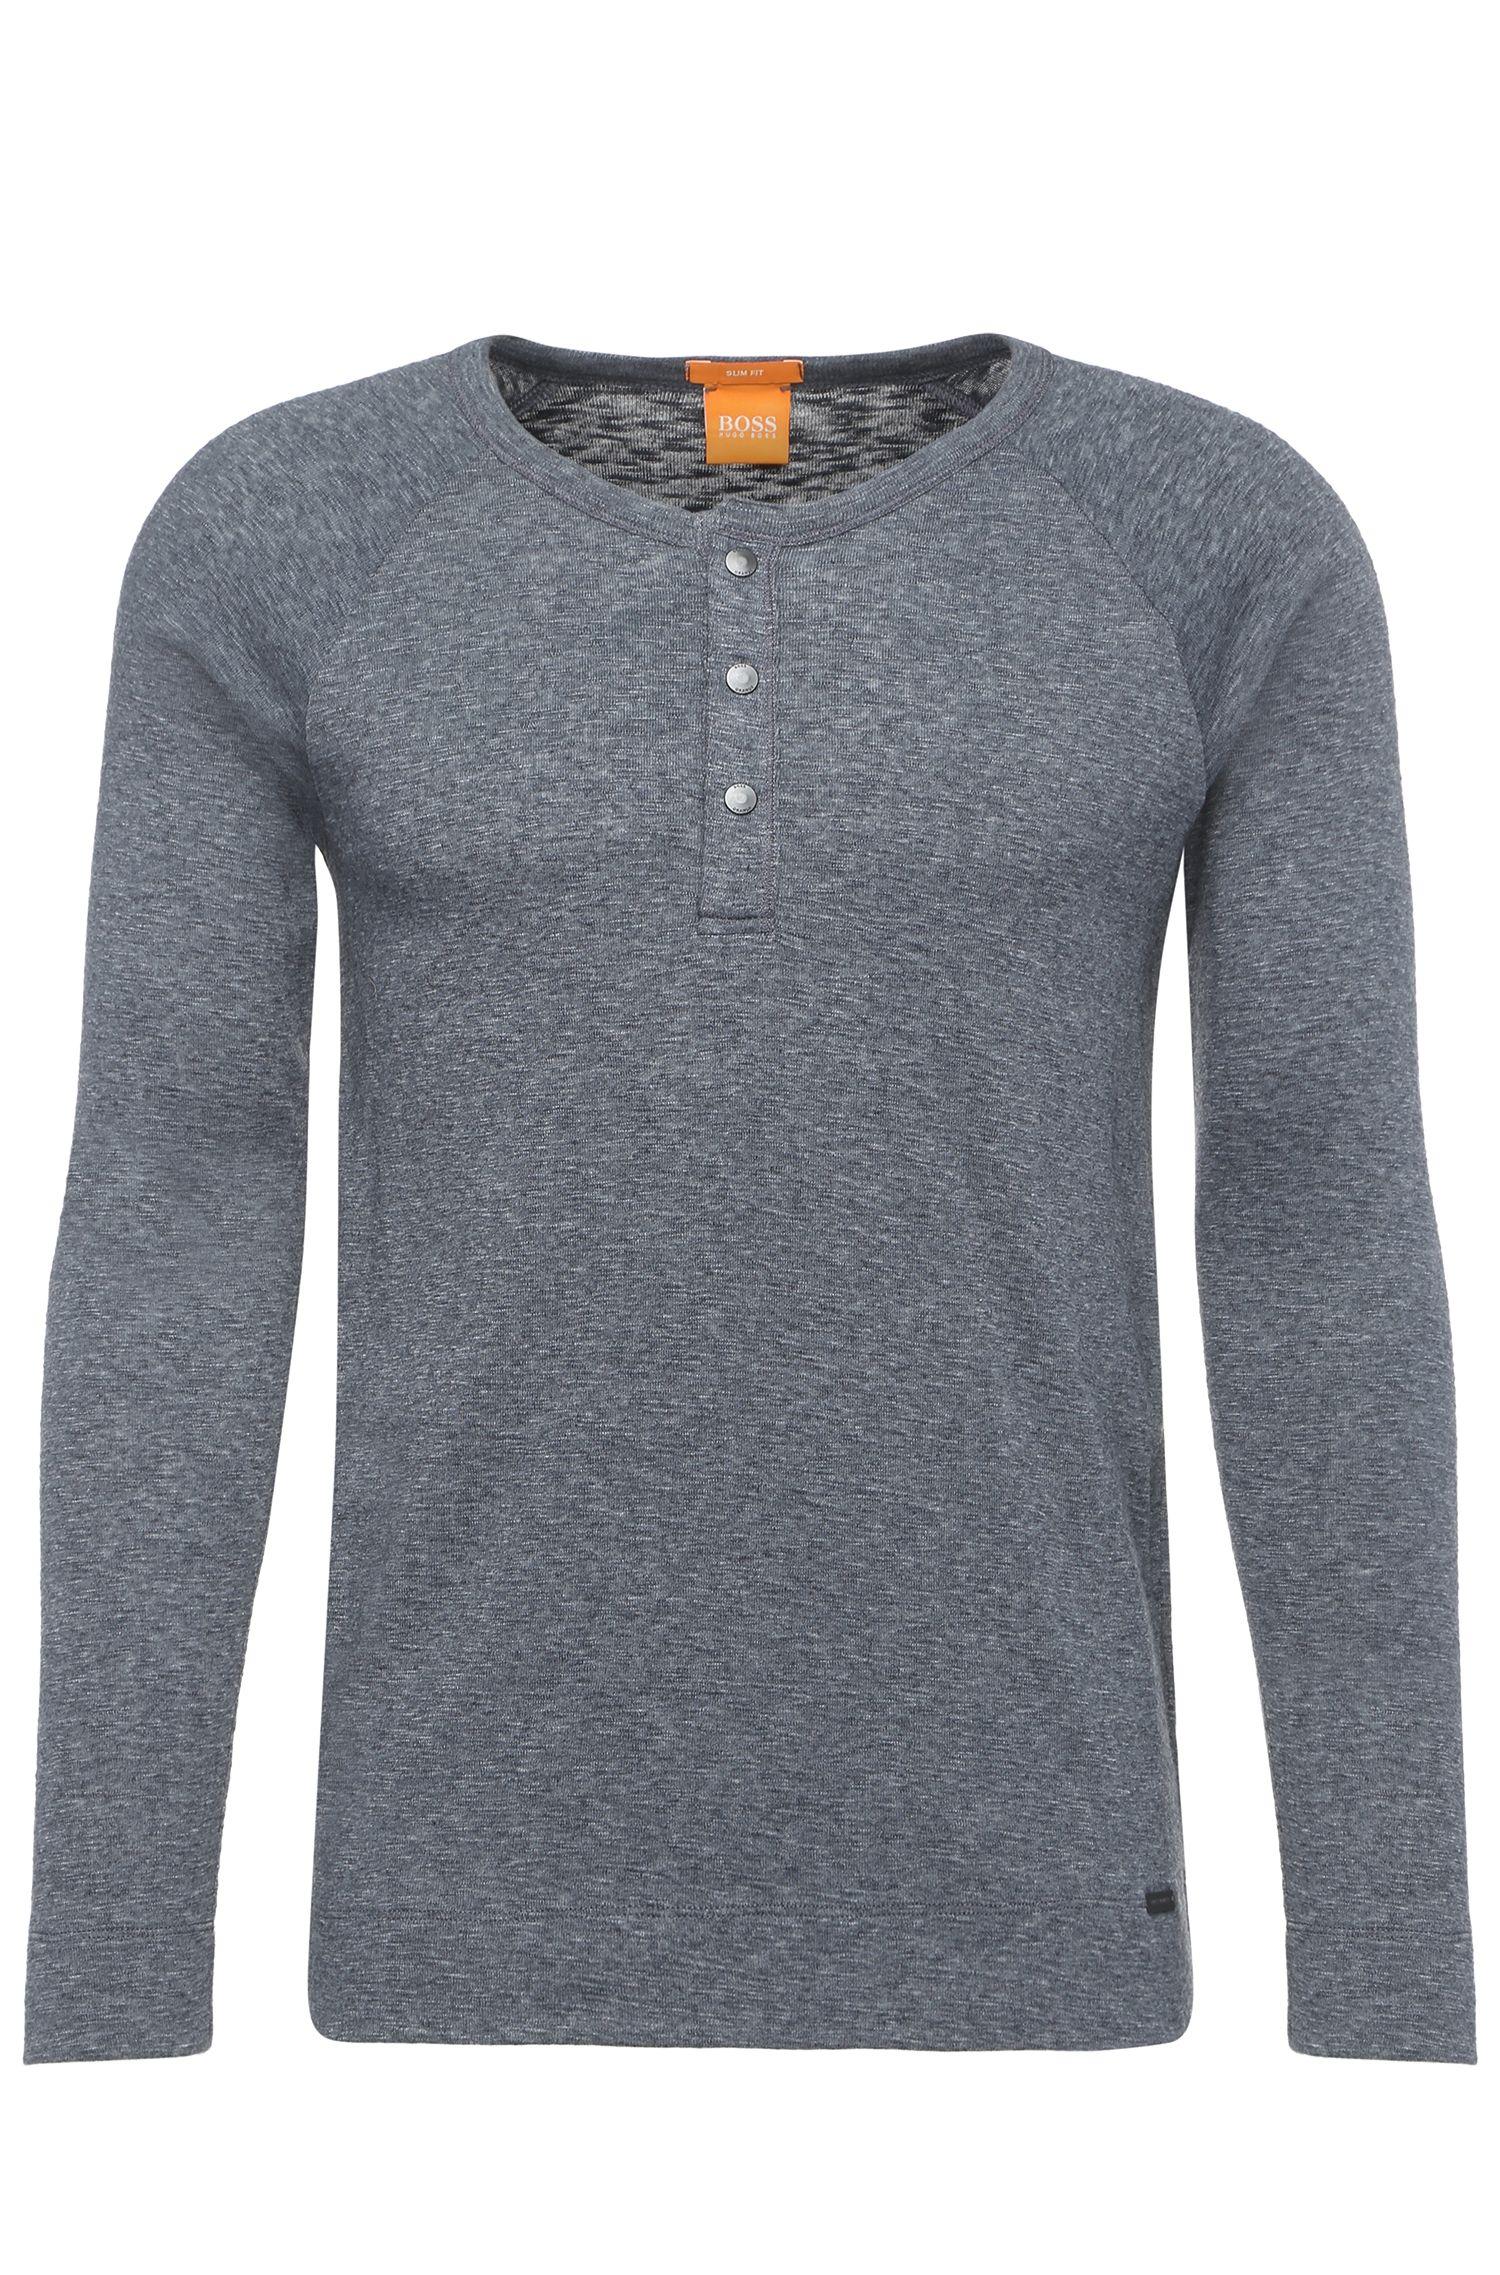 'Tambow'   Cotton Blend Long Sleeve Burnout T-Shirt